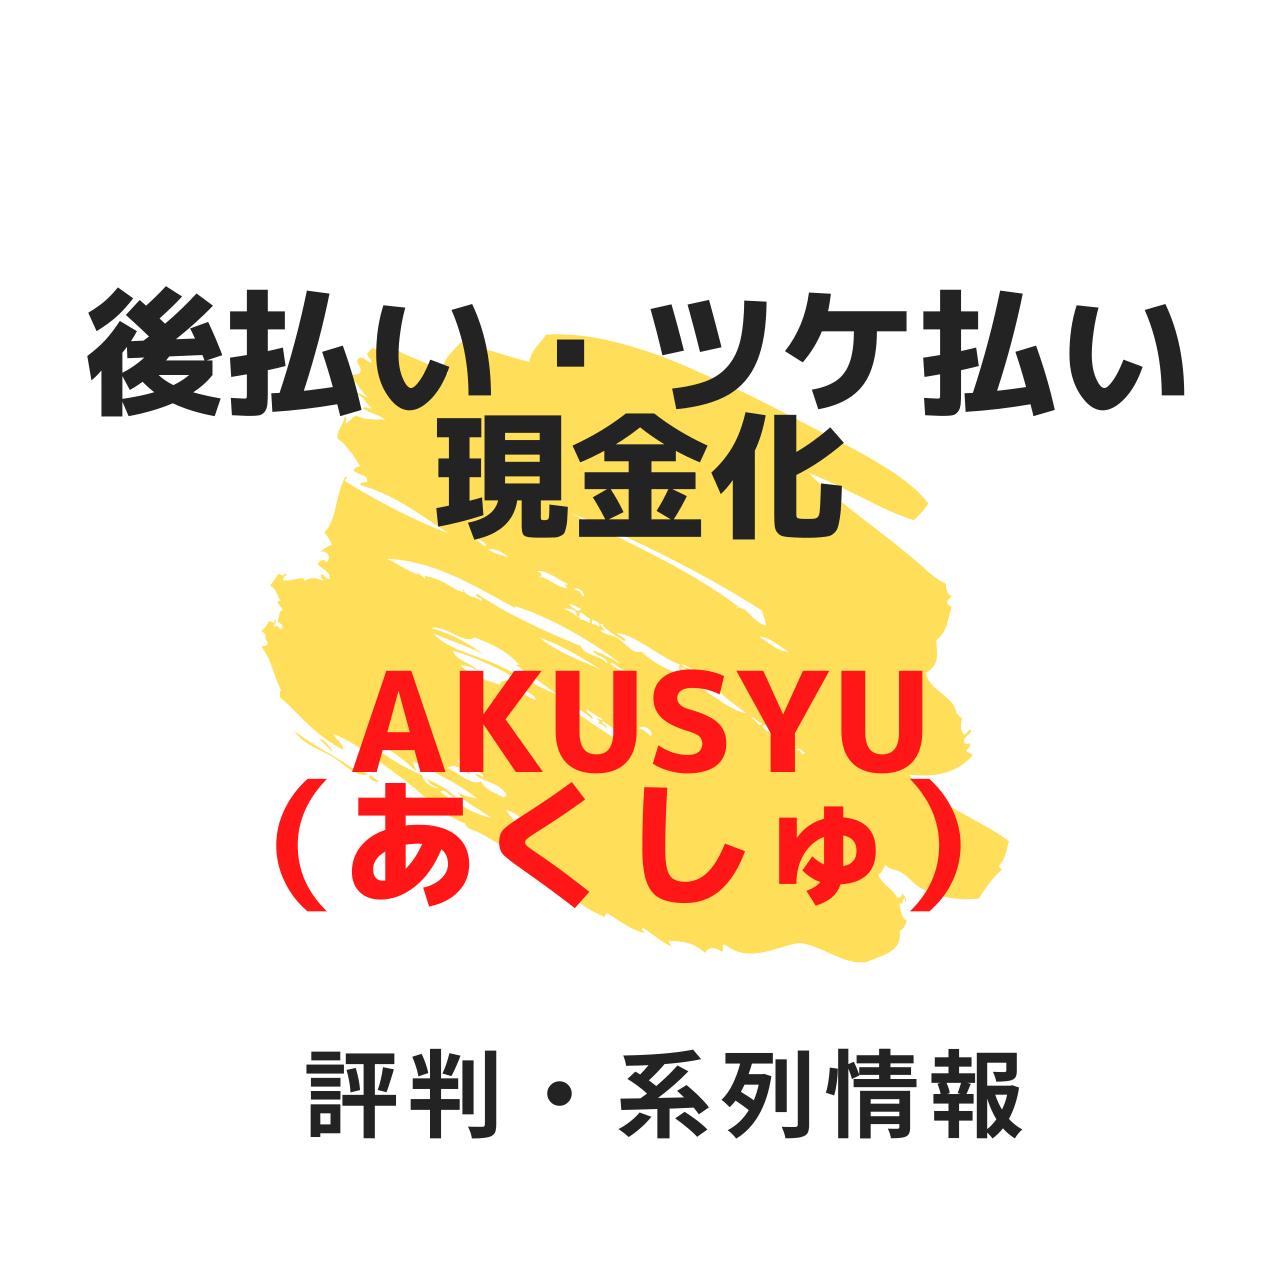 AKUSHU(あくしゅ)の後払い現金化の評判・口コミ・系列情報を調査